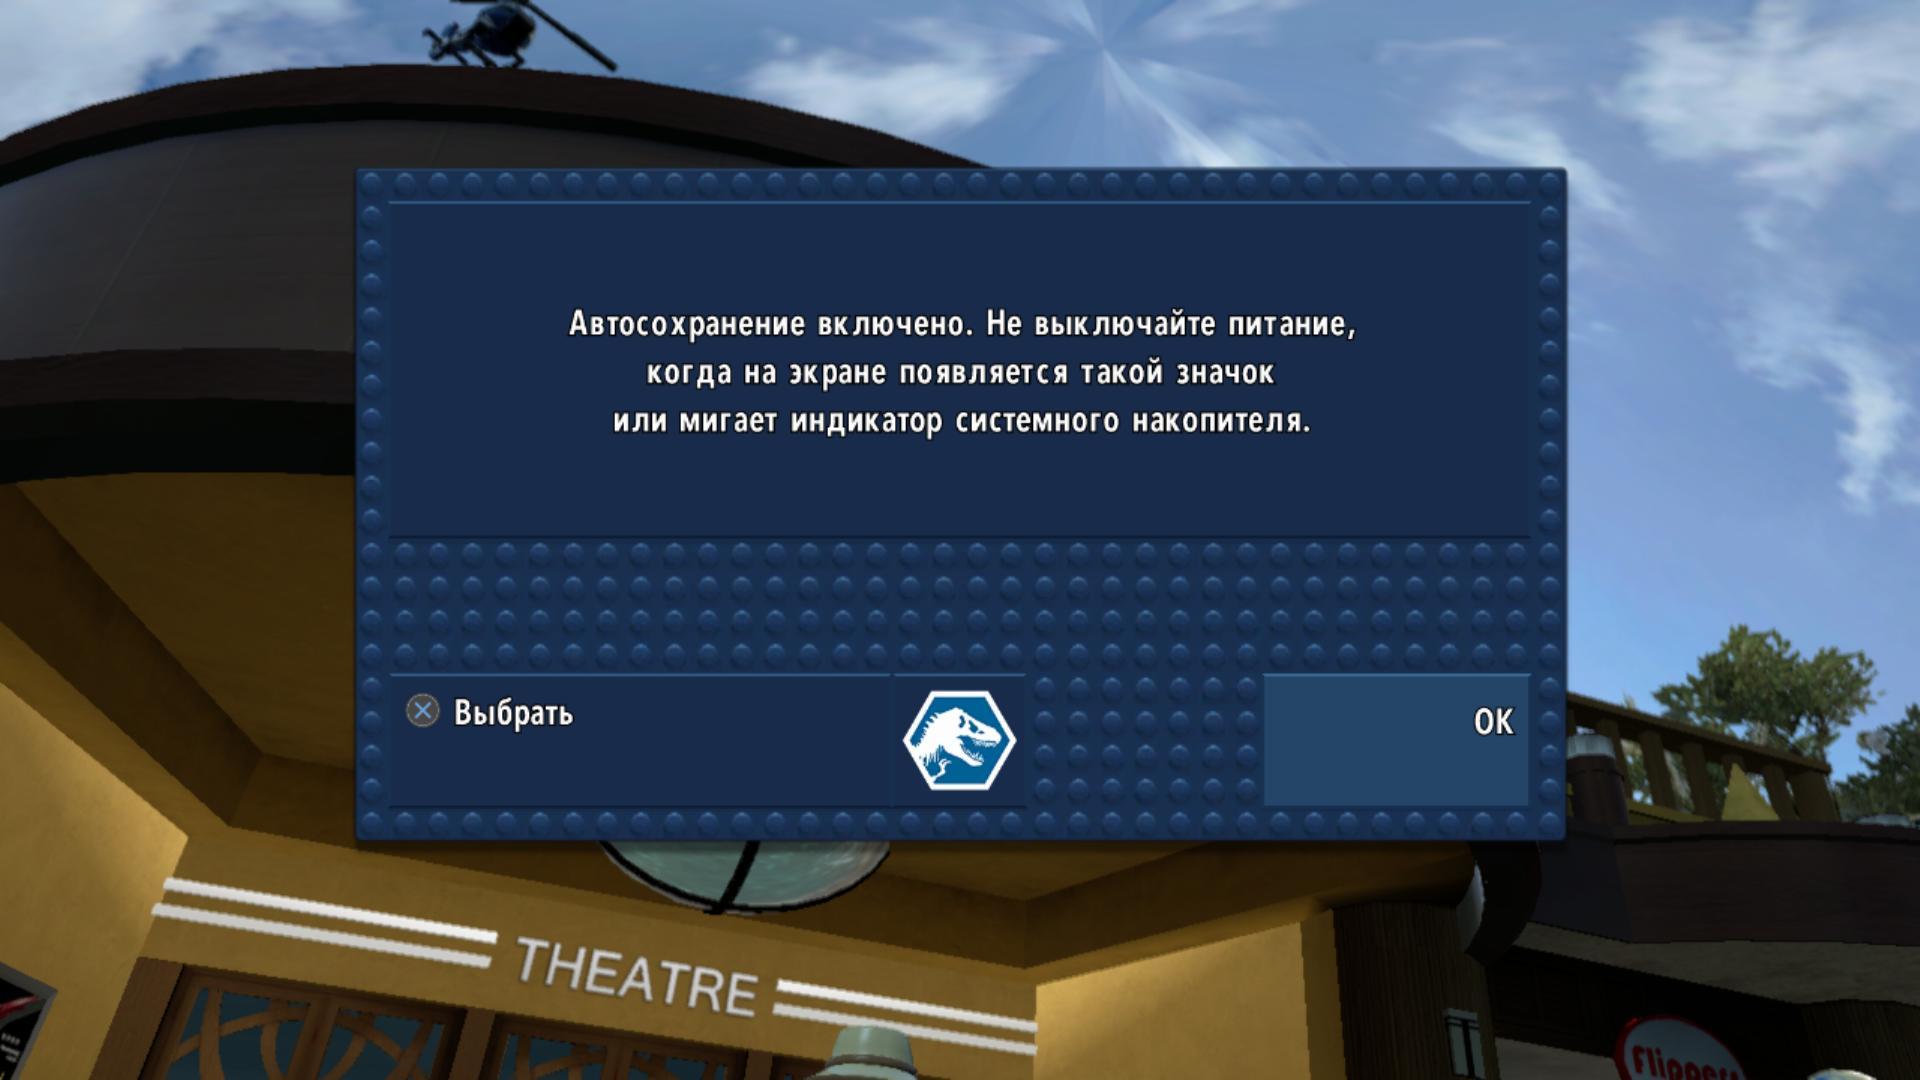 https://img-fotki.yandex.ru/get/3003/130290421.3/0_1130e5_dfd77b18_orig.jpg